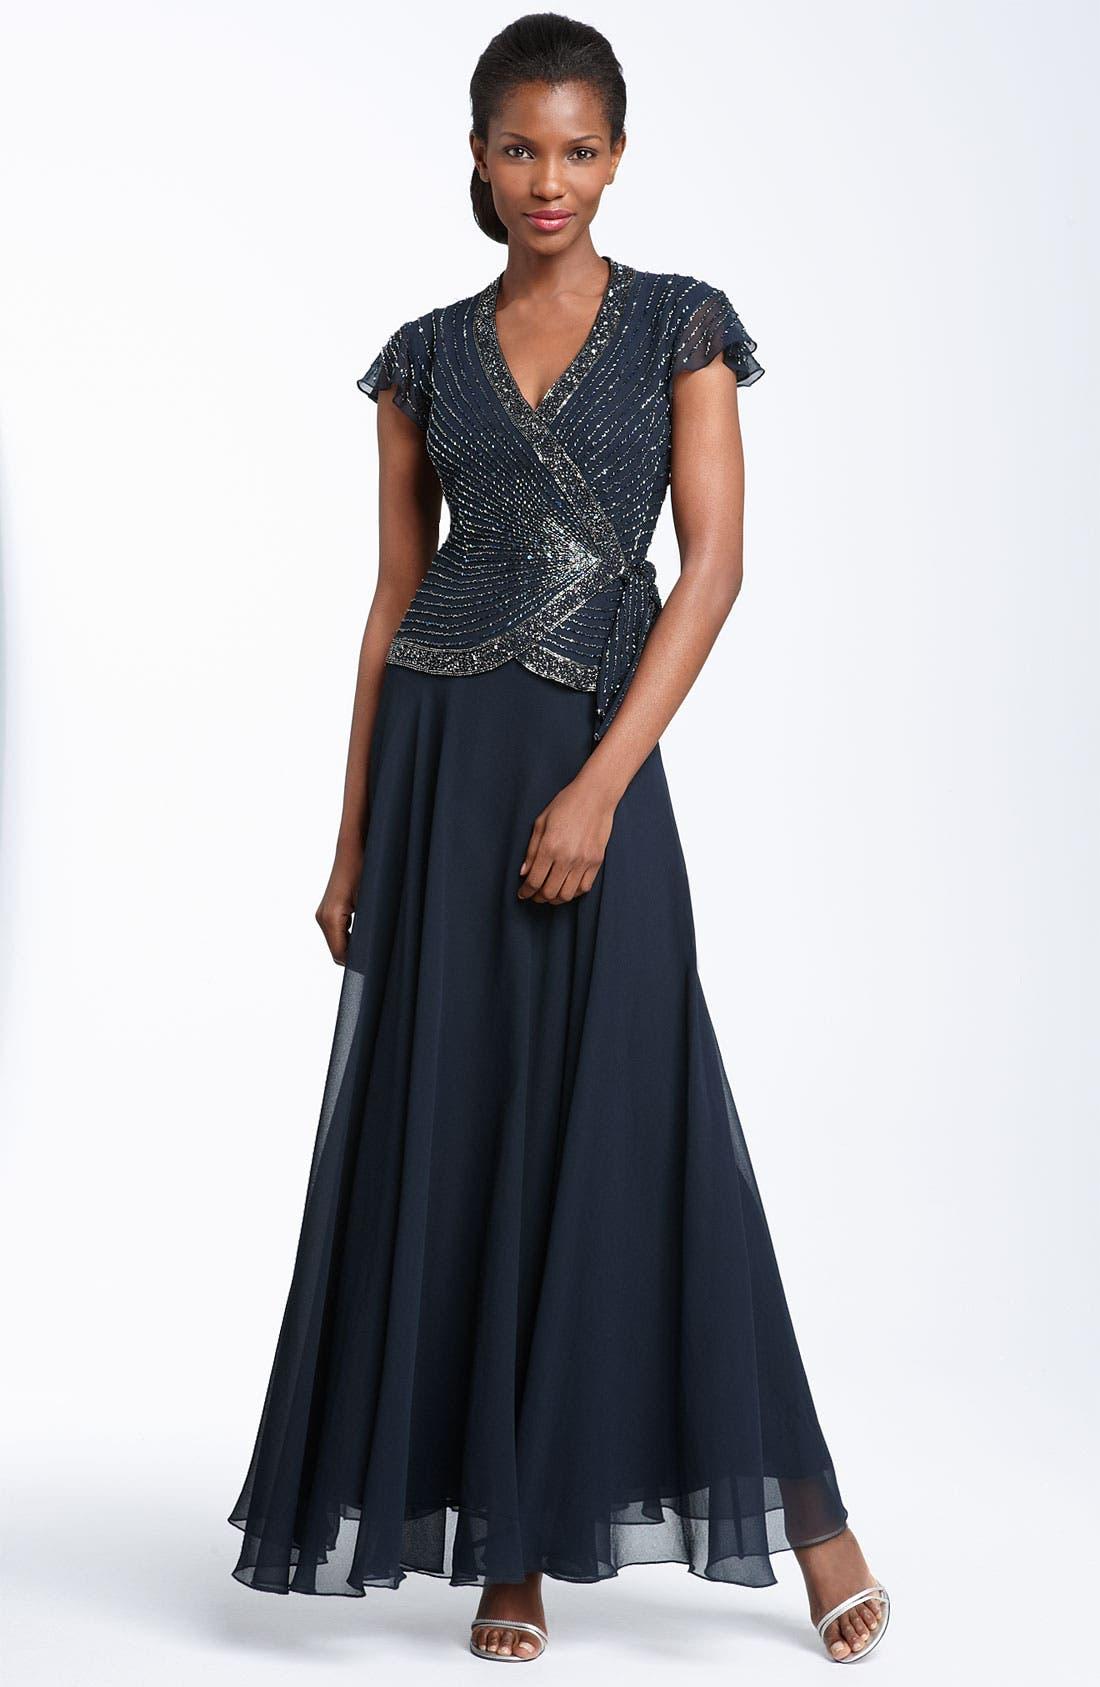 Alternate Image 1 Selected - J Kara Beaded Chiffon Gown (Regular & Petite)